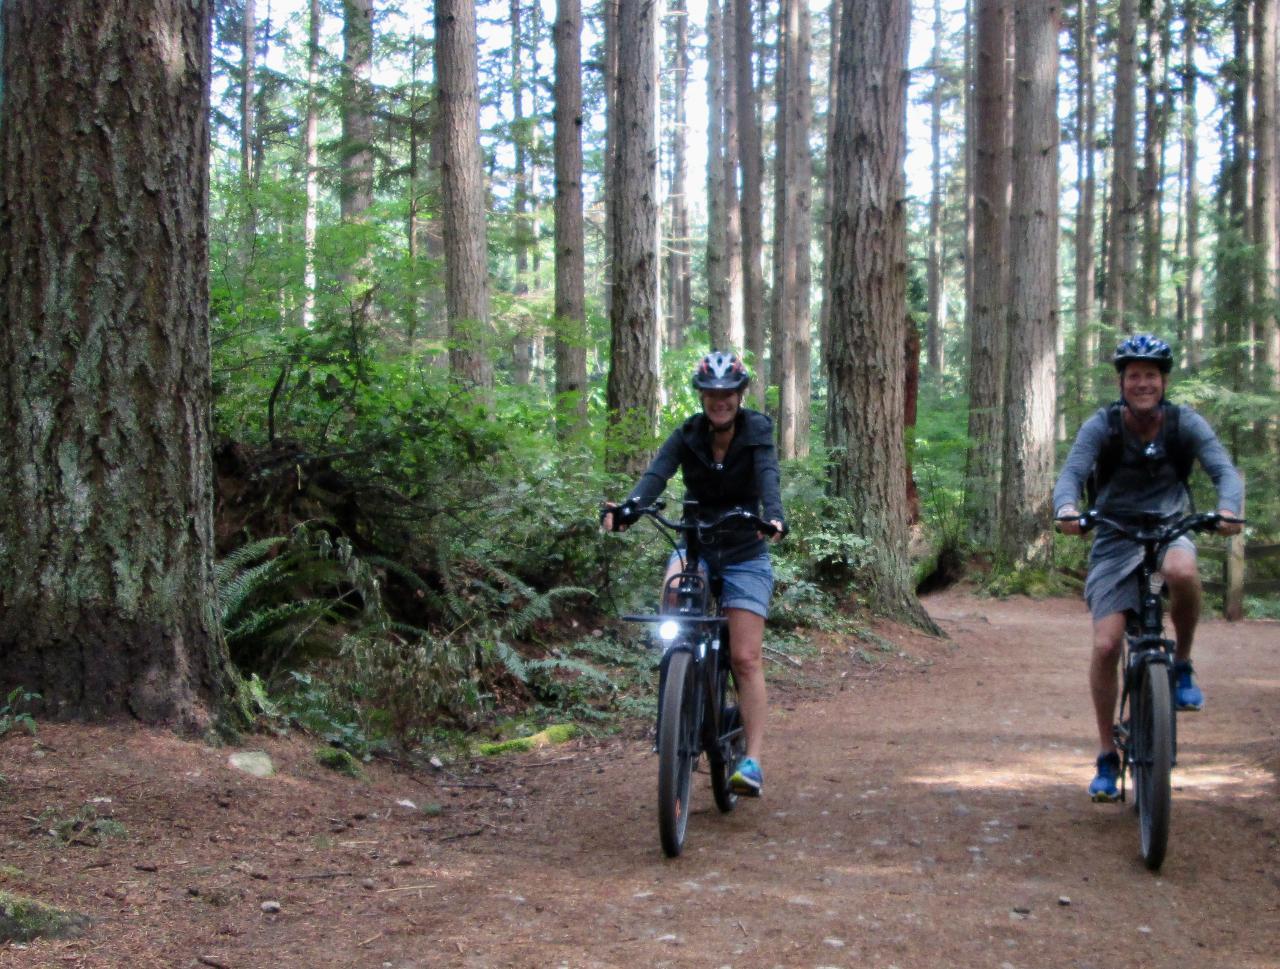 Beyond City Sights E-Bike Adventure Tour - Self-Guided